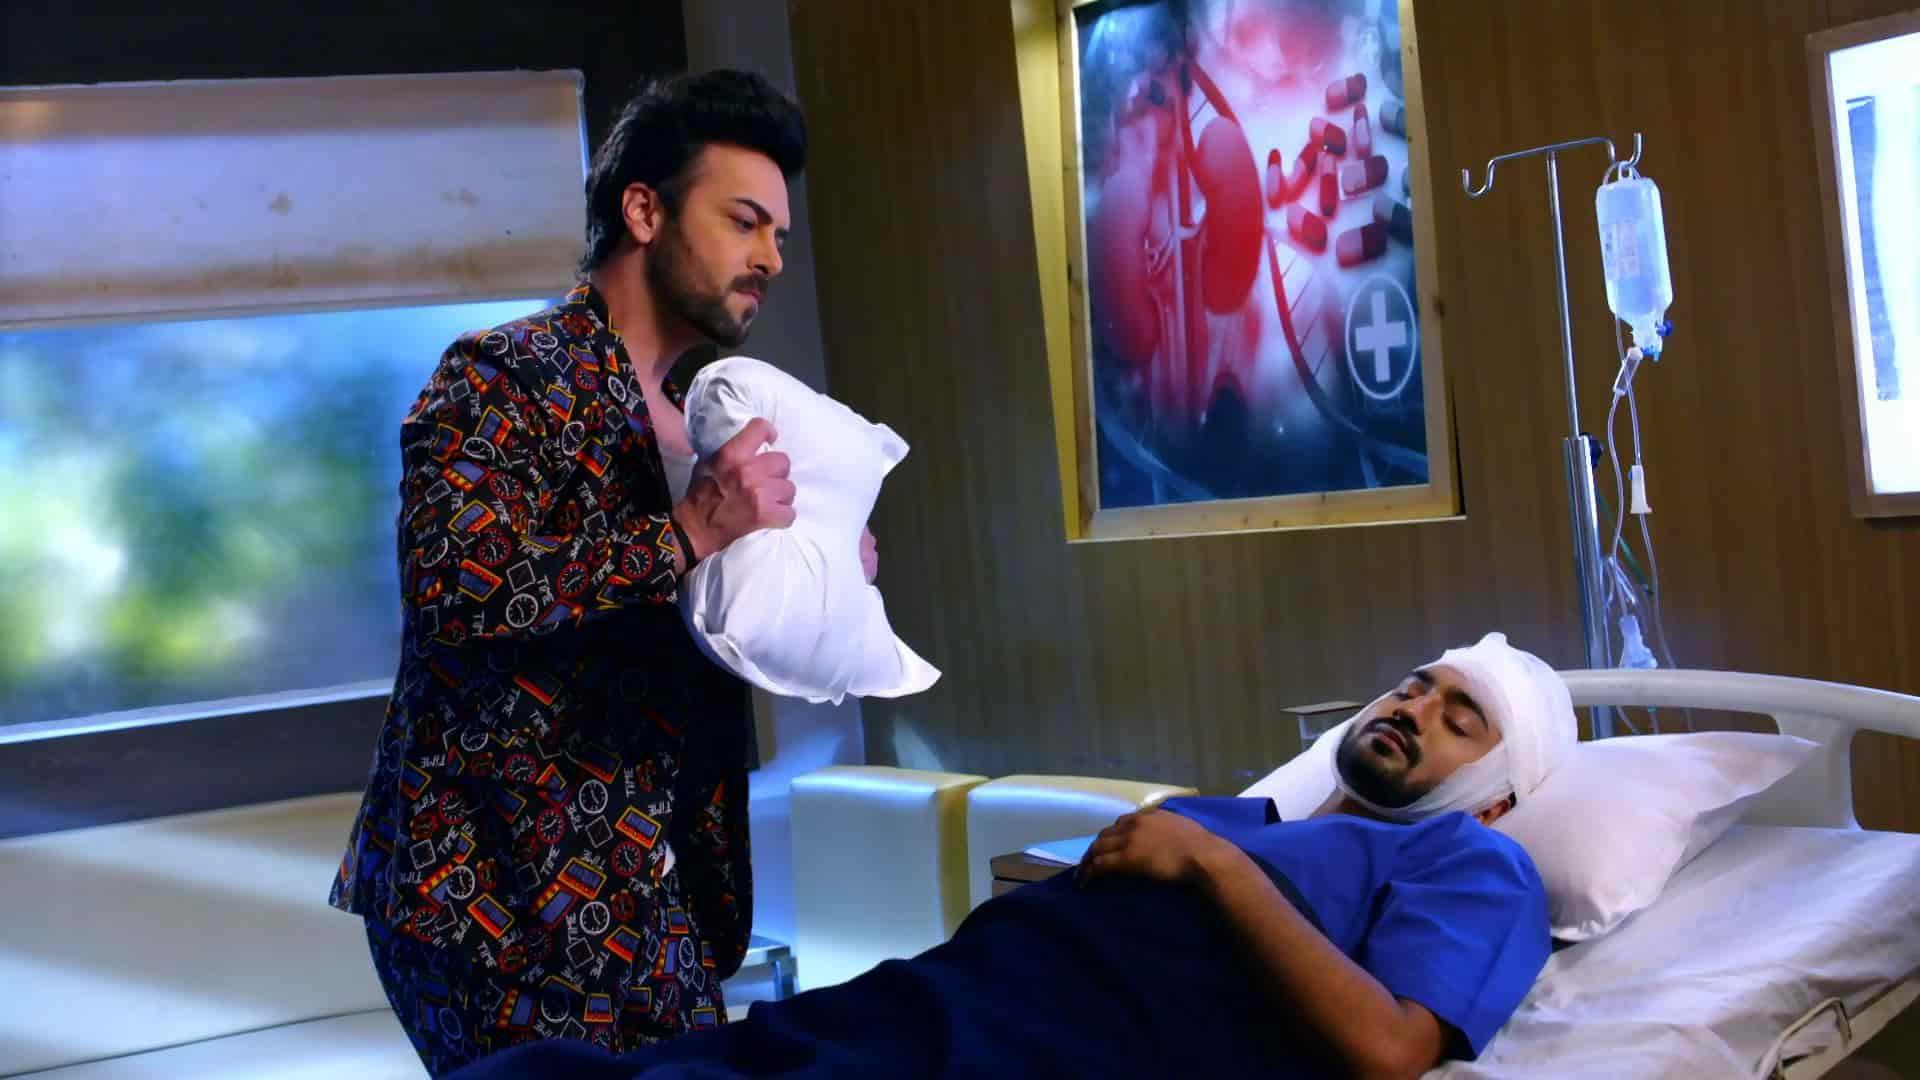 Kundali Bhagya 27 October 2021 Written Update: Prithvi visits the hospital to kill Sandeep